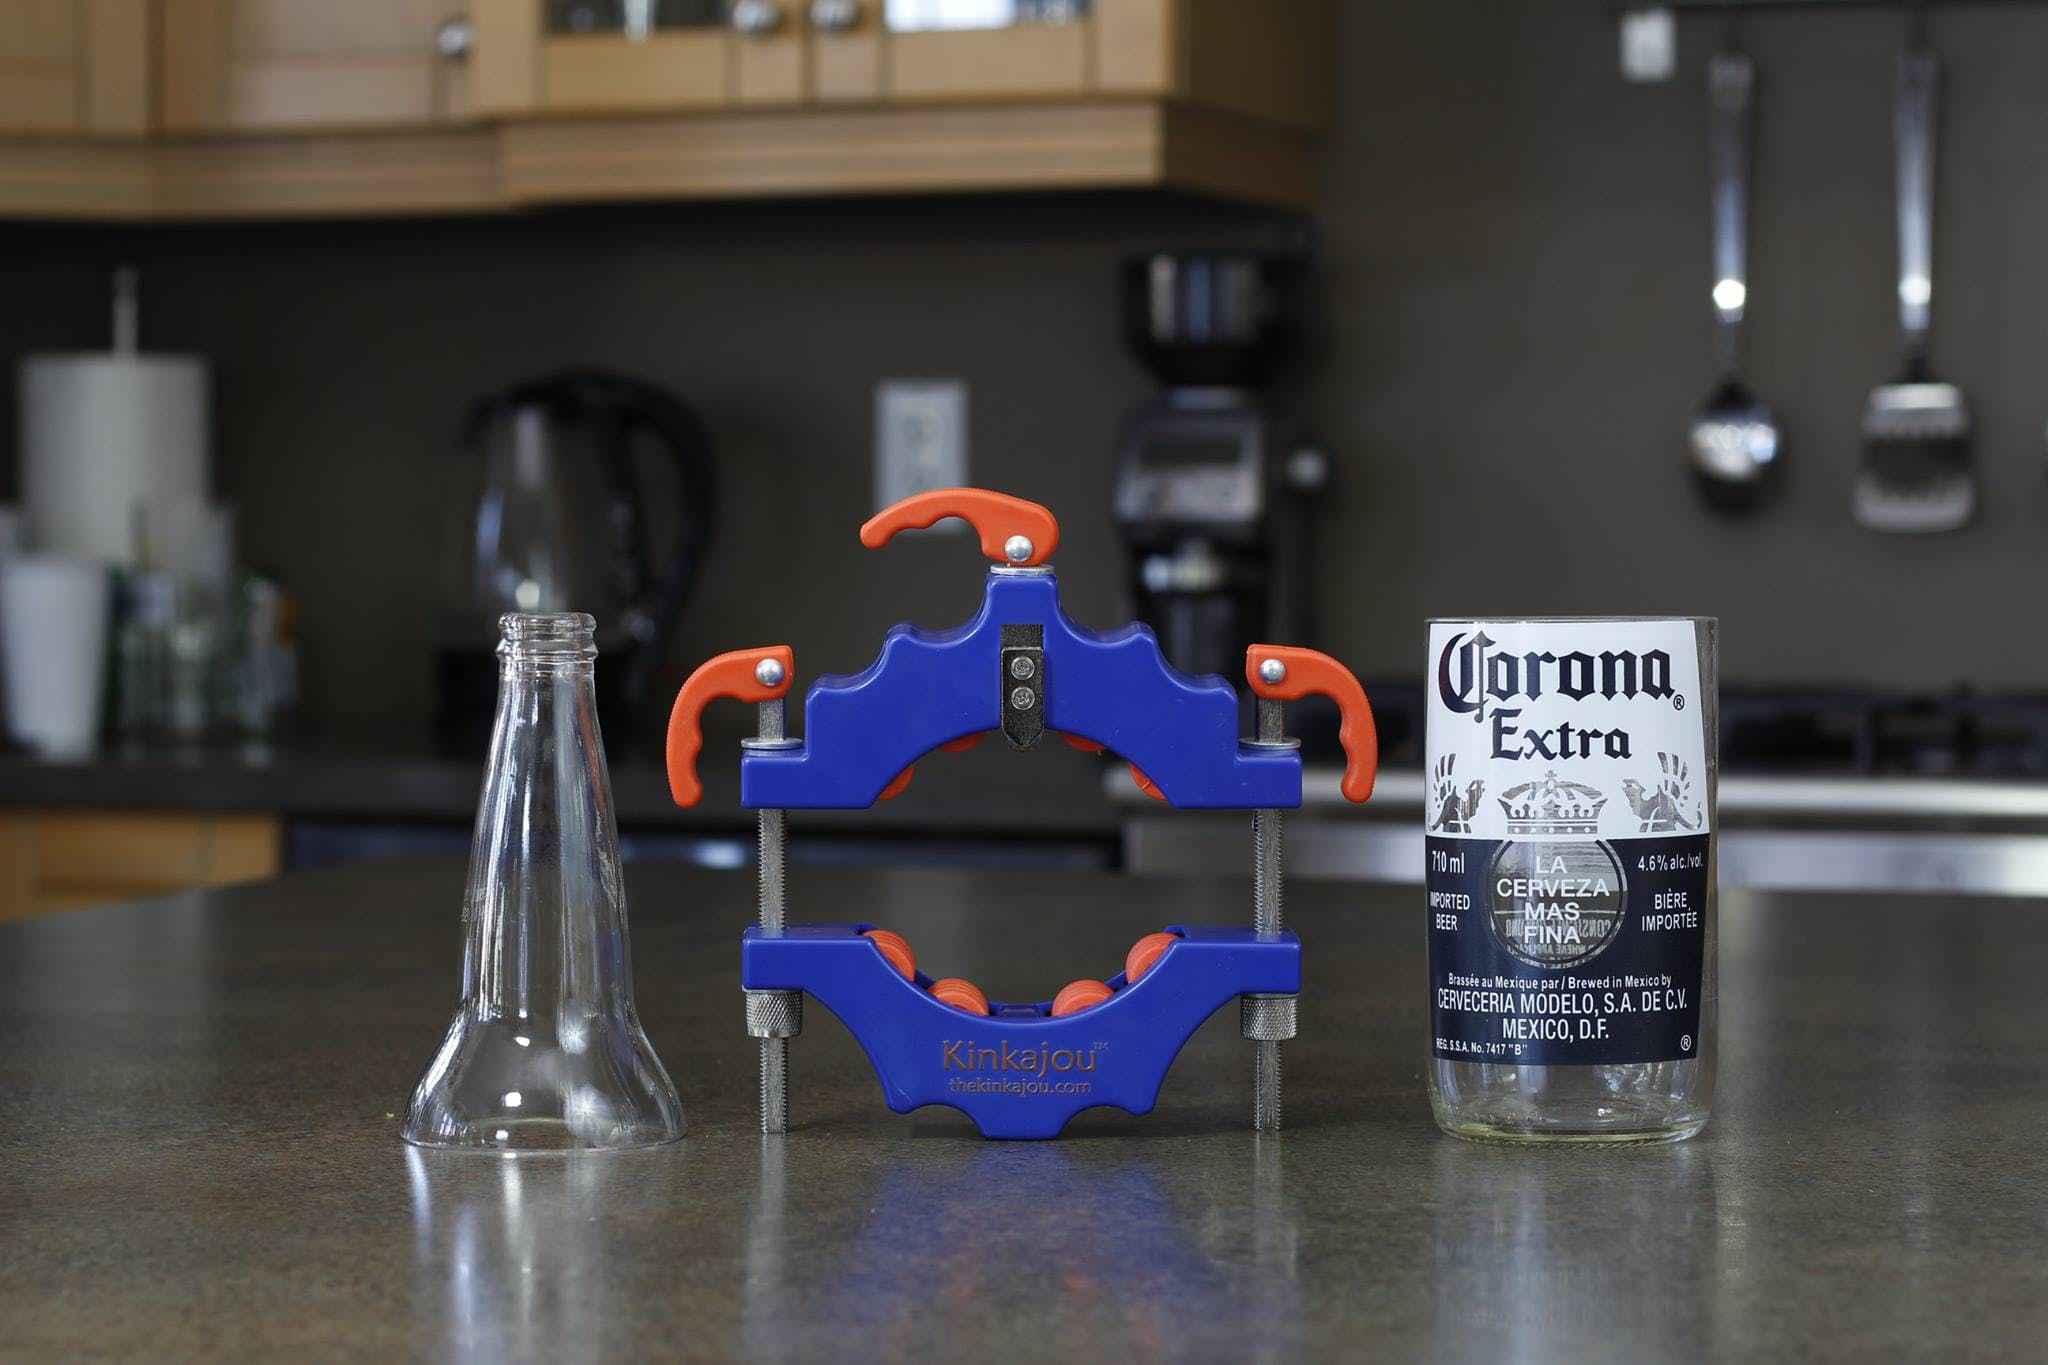 En Les Kit Transformer Bottle Pour Bouteilles Kinkajou CutterLe DIeWEHY29